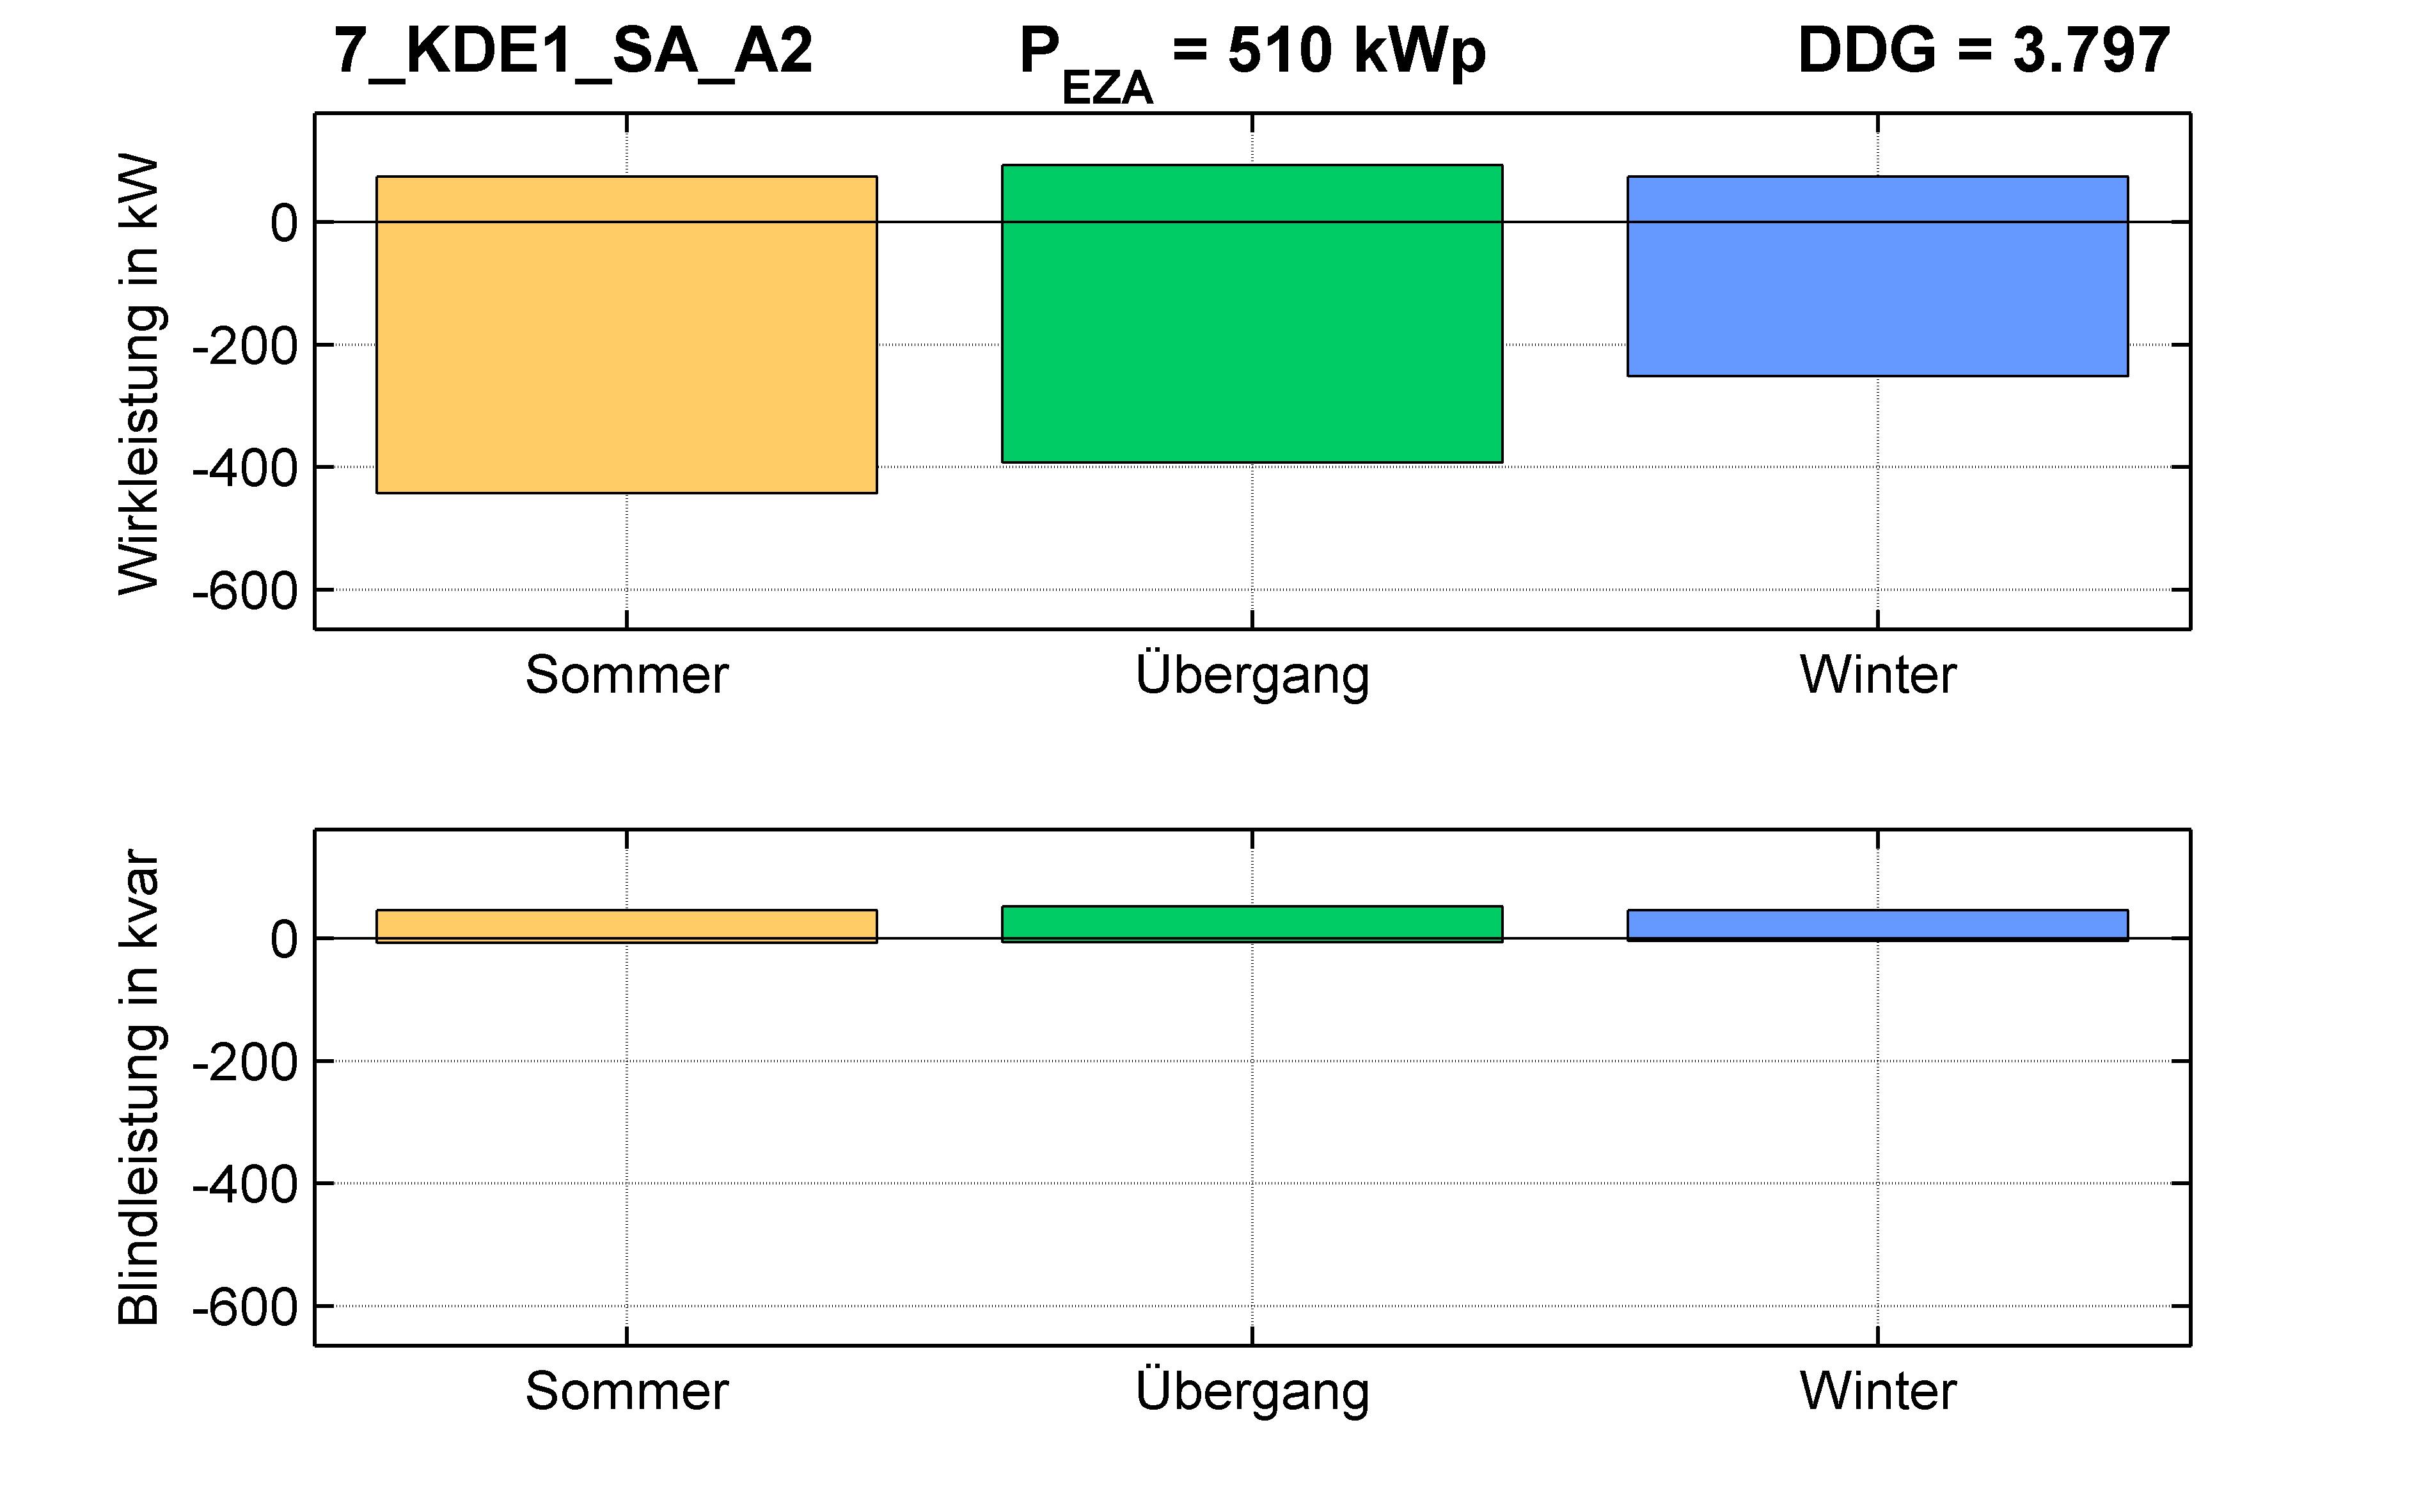 KDE1 | Längsregler (SA) A2 | PQ-Bilanz